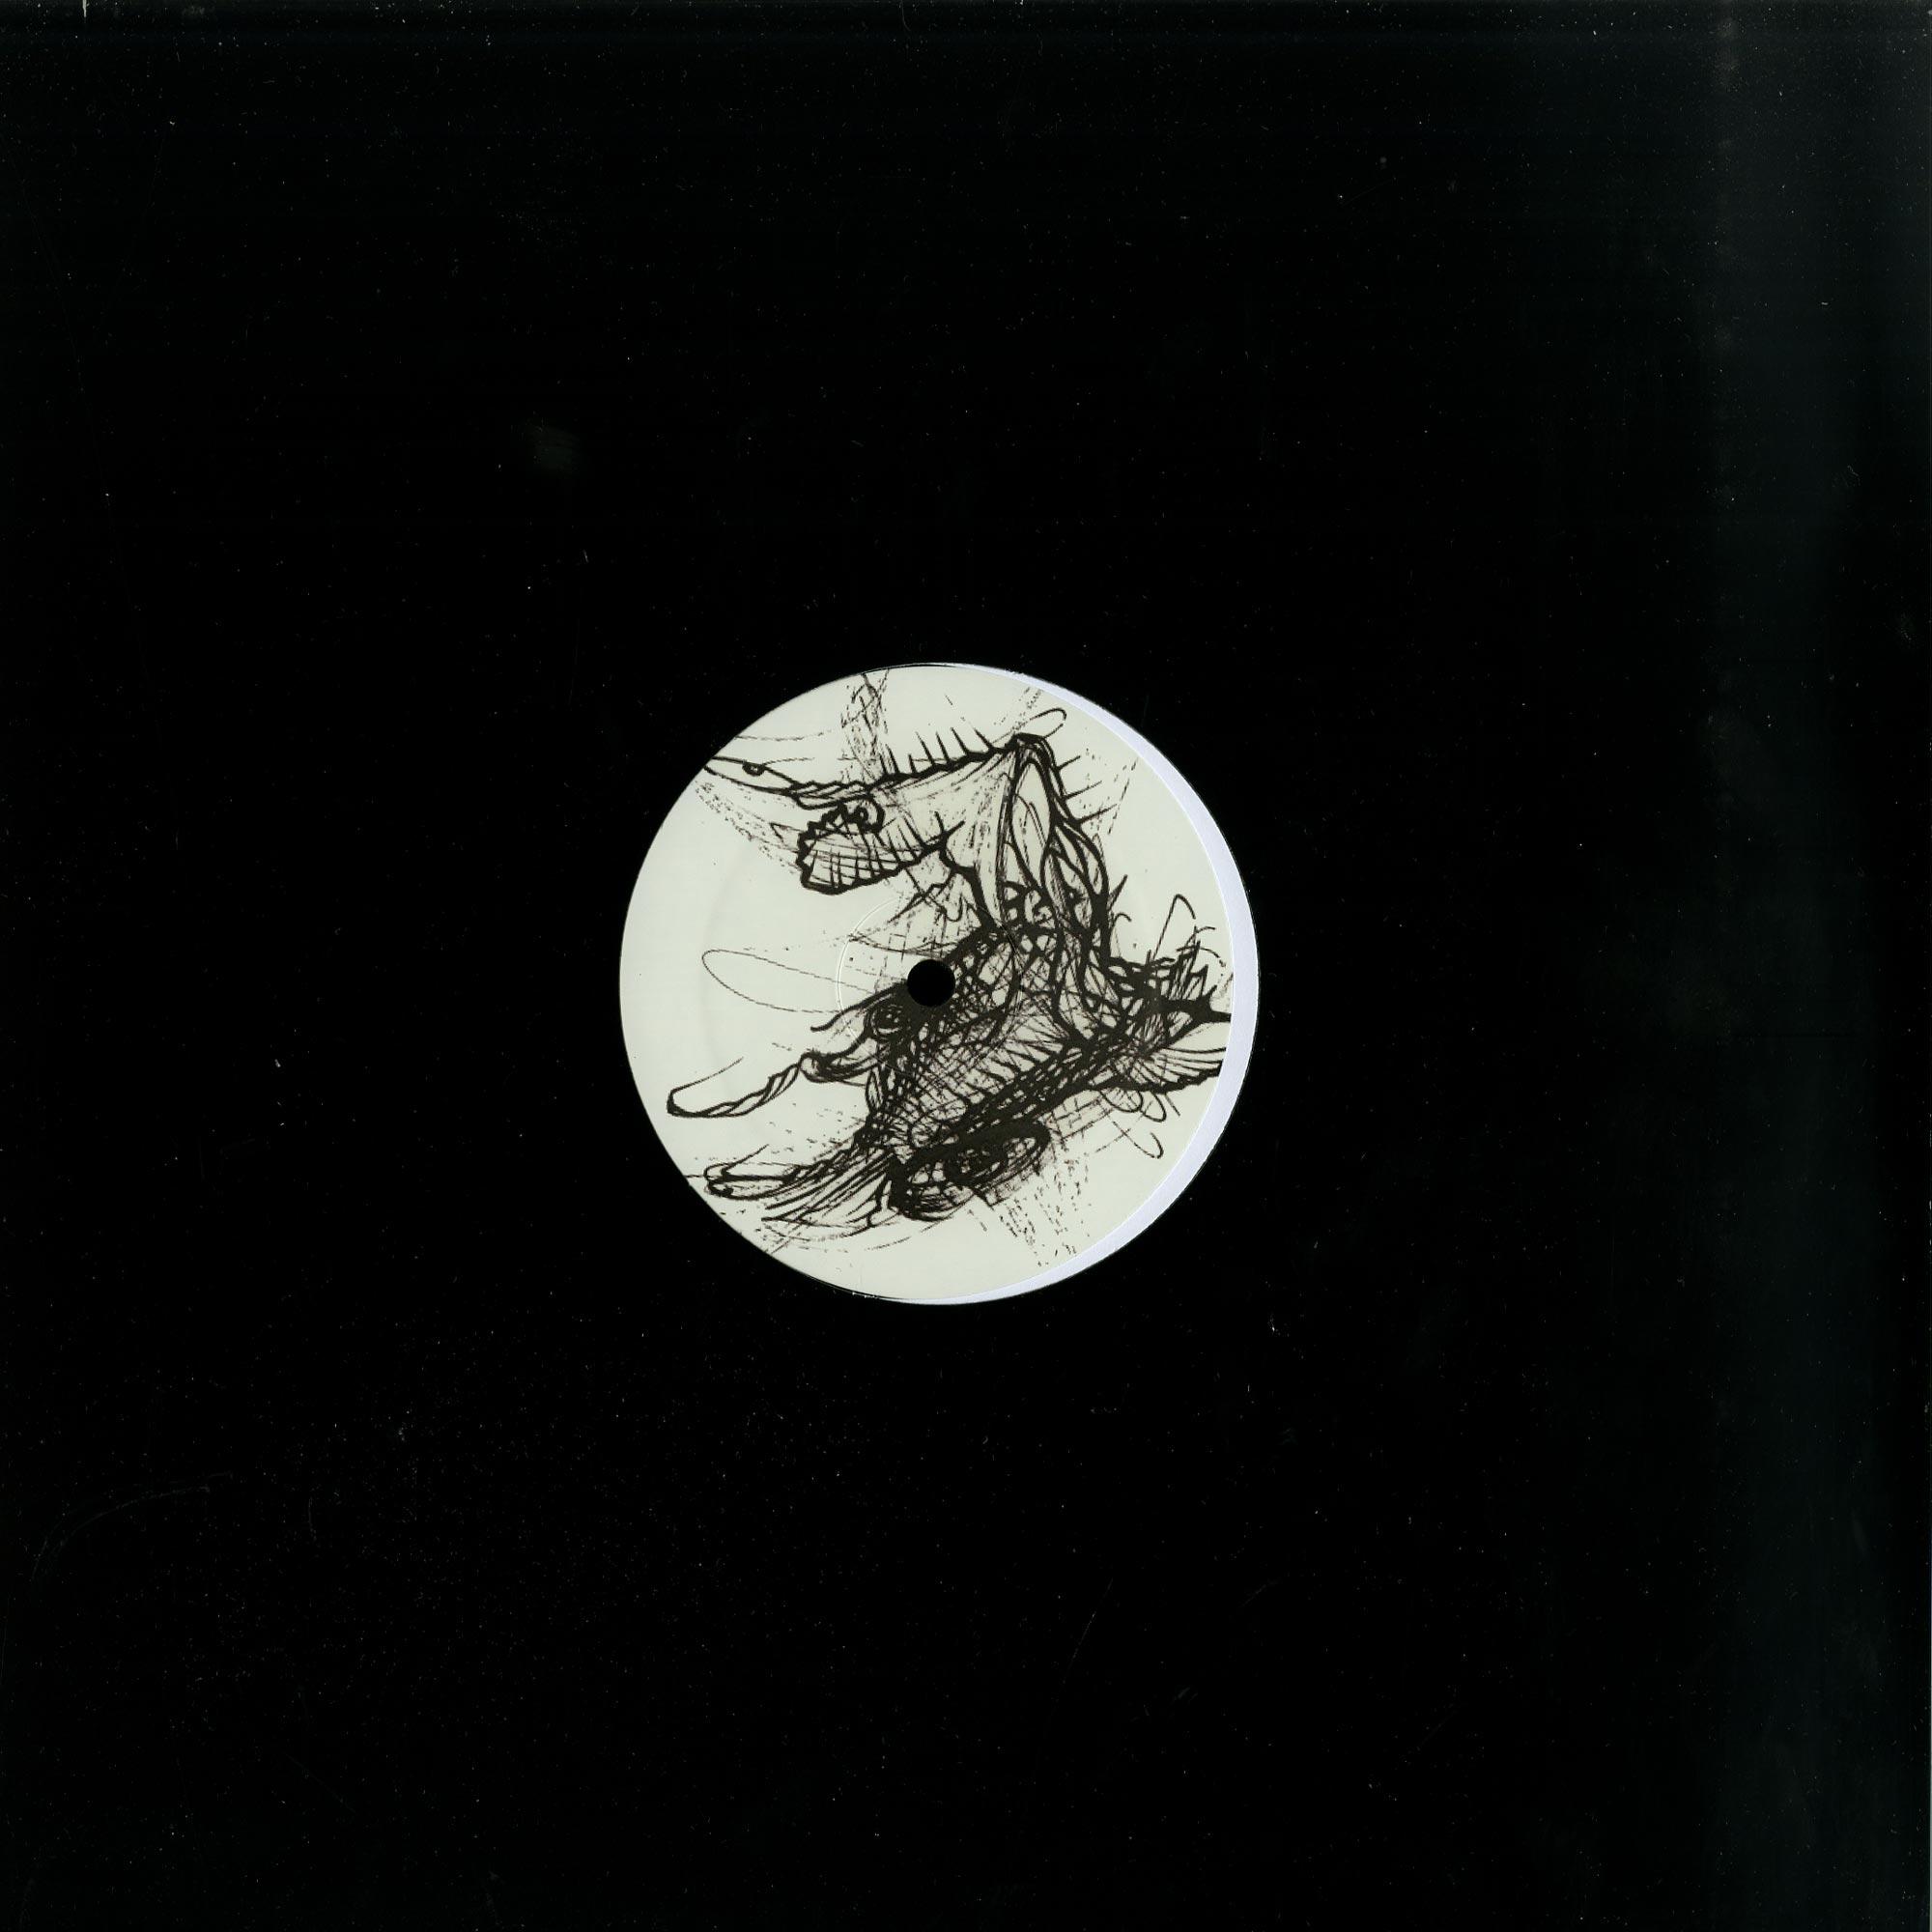 Dark Quadrant - THE COSMIC PERSPECTIVE